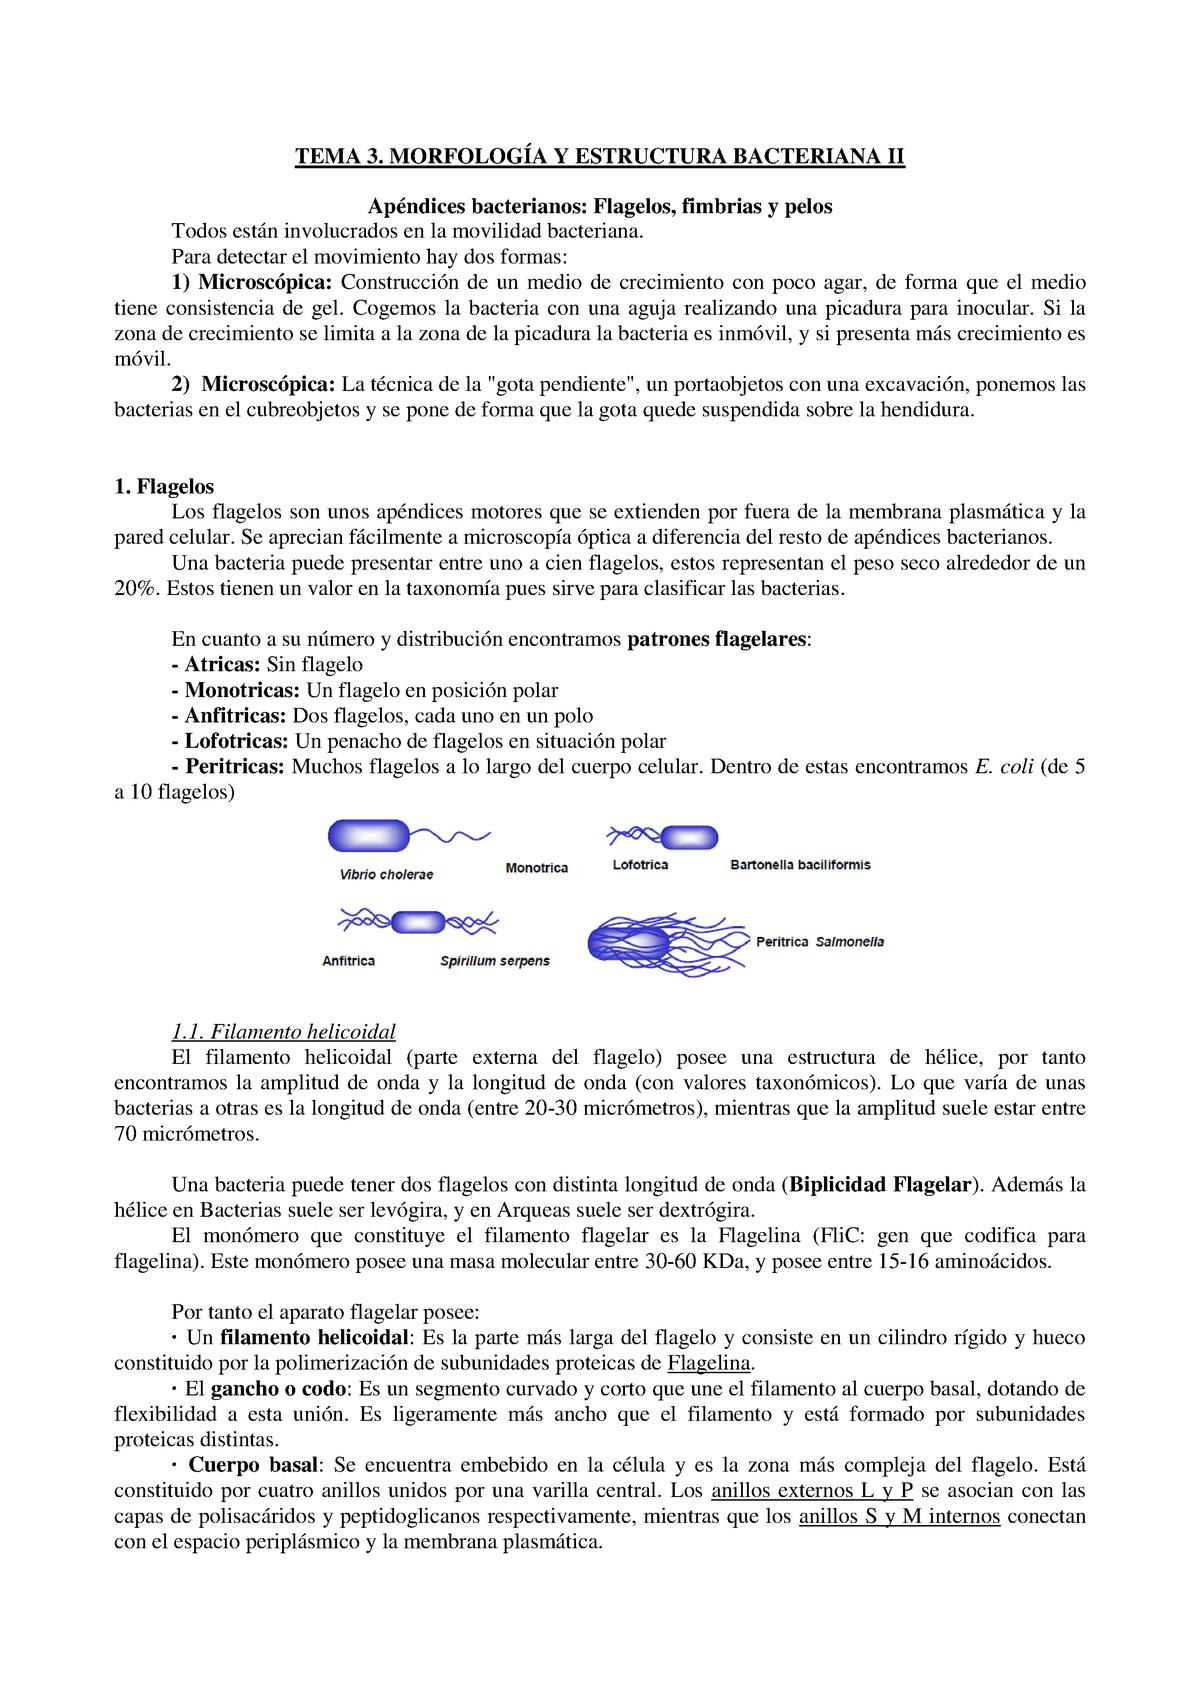 Tema 3 M Microbiologia Ucm Studocu